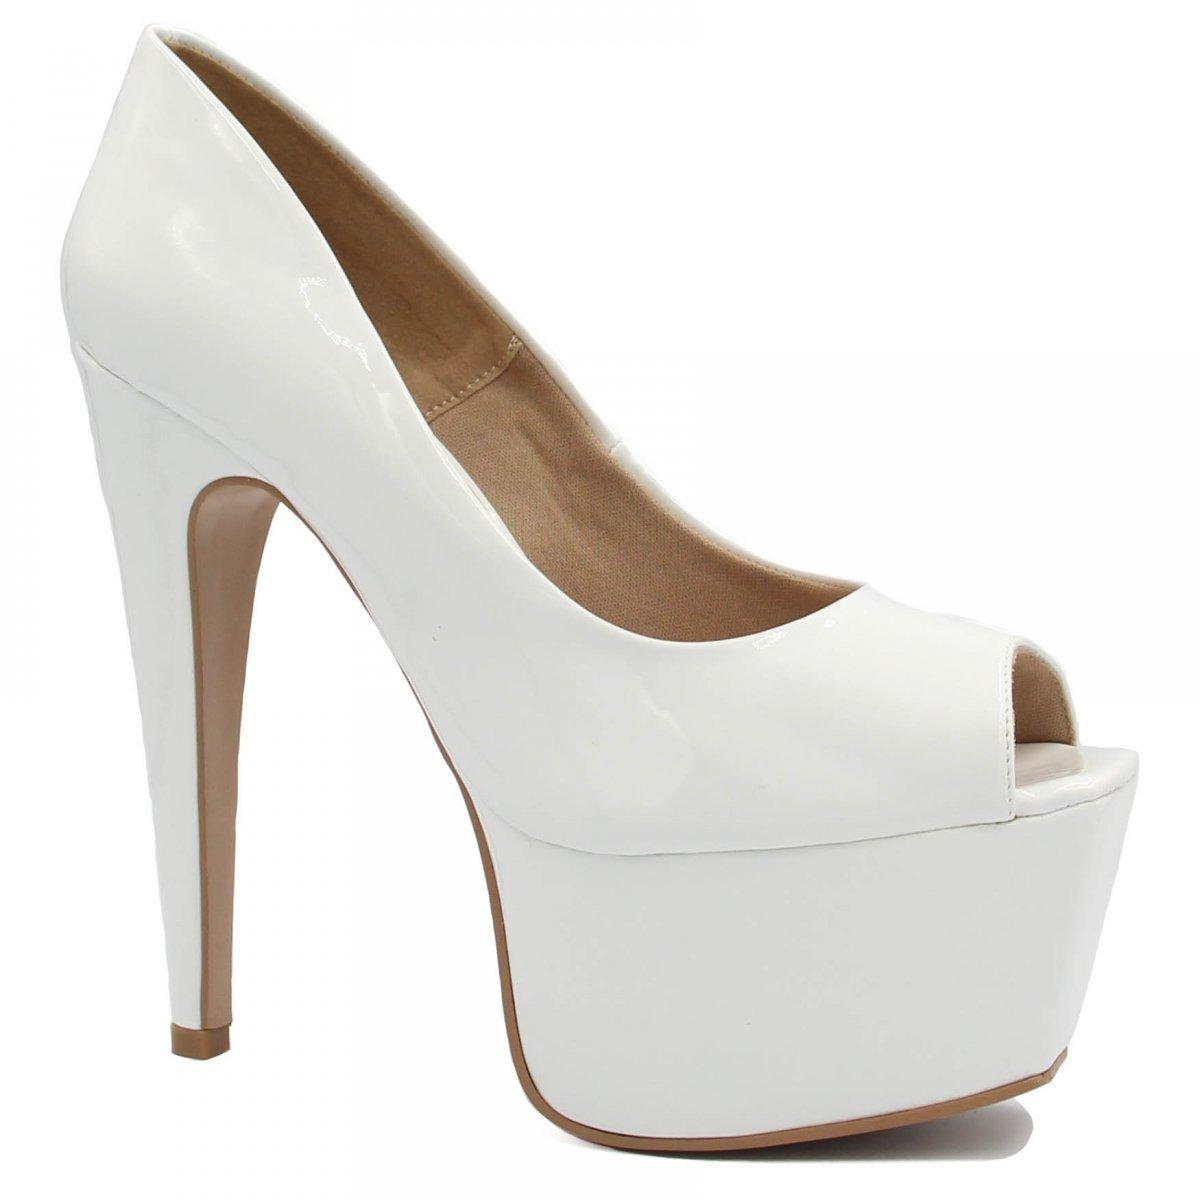 Meia Peep Branco Shoes Shoes Zariff Branco Meia Pata Zariff Pata Toe Peep Toe agIwqO